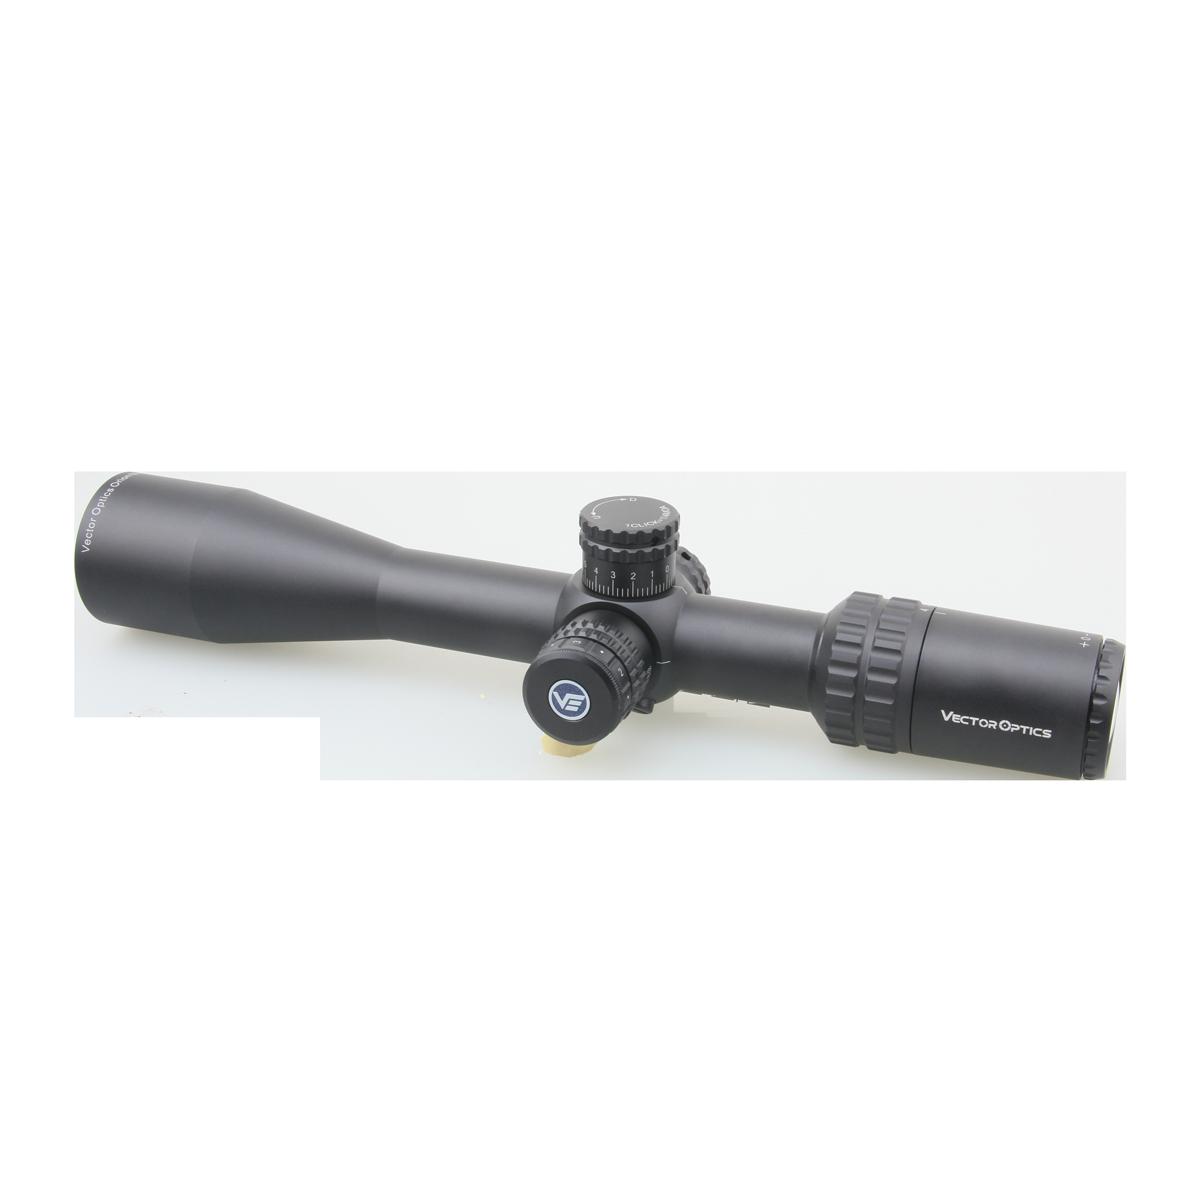 Orion 4-16x44 MAX Riflescope